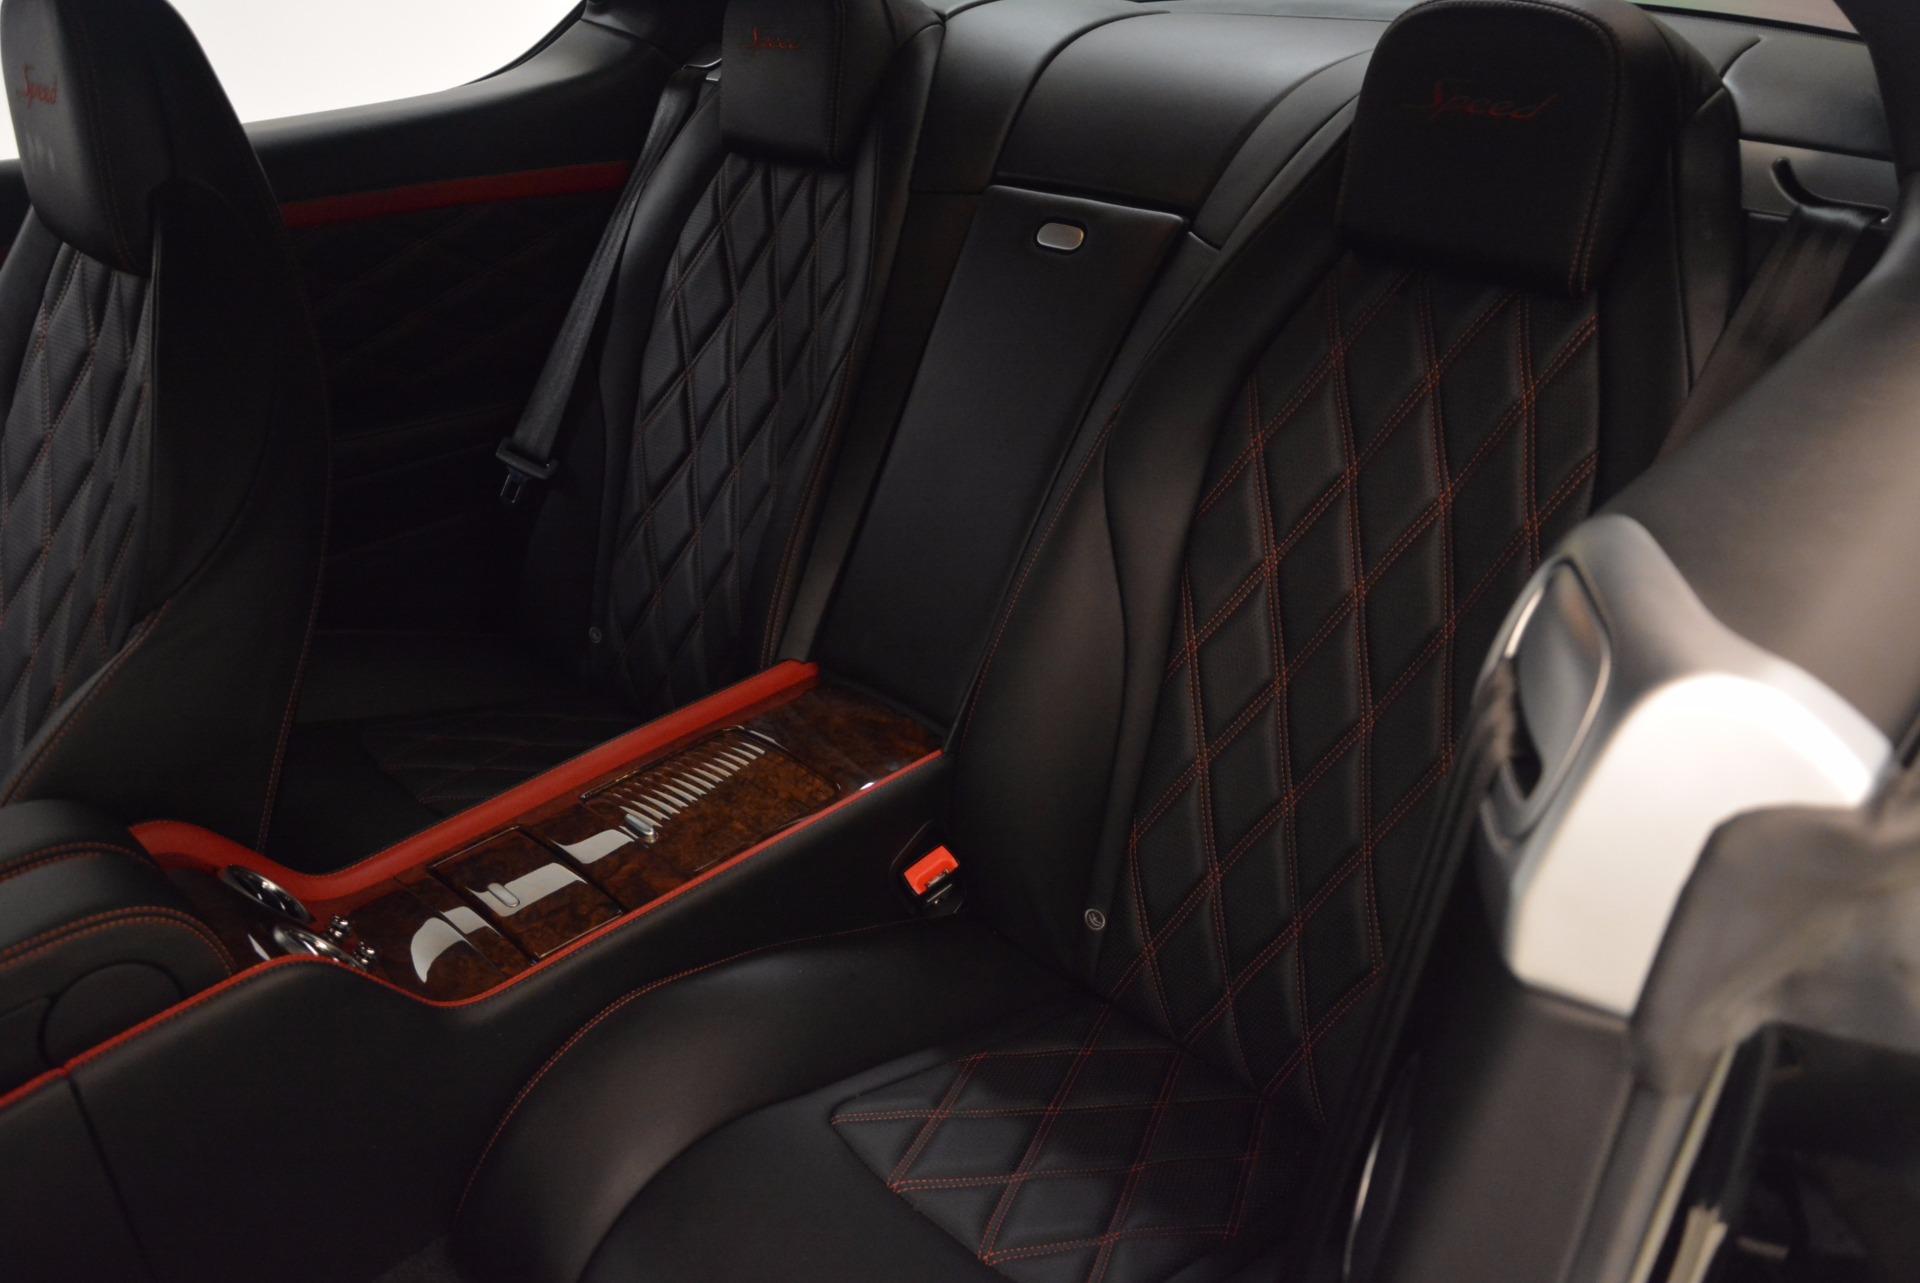 Used 2015 Bentley Continental GT Speed For Sale In Westport, CT 1646_p27